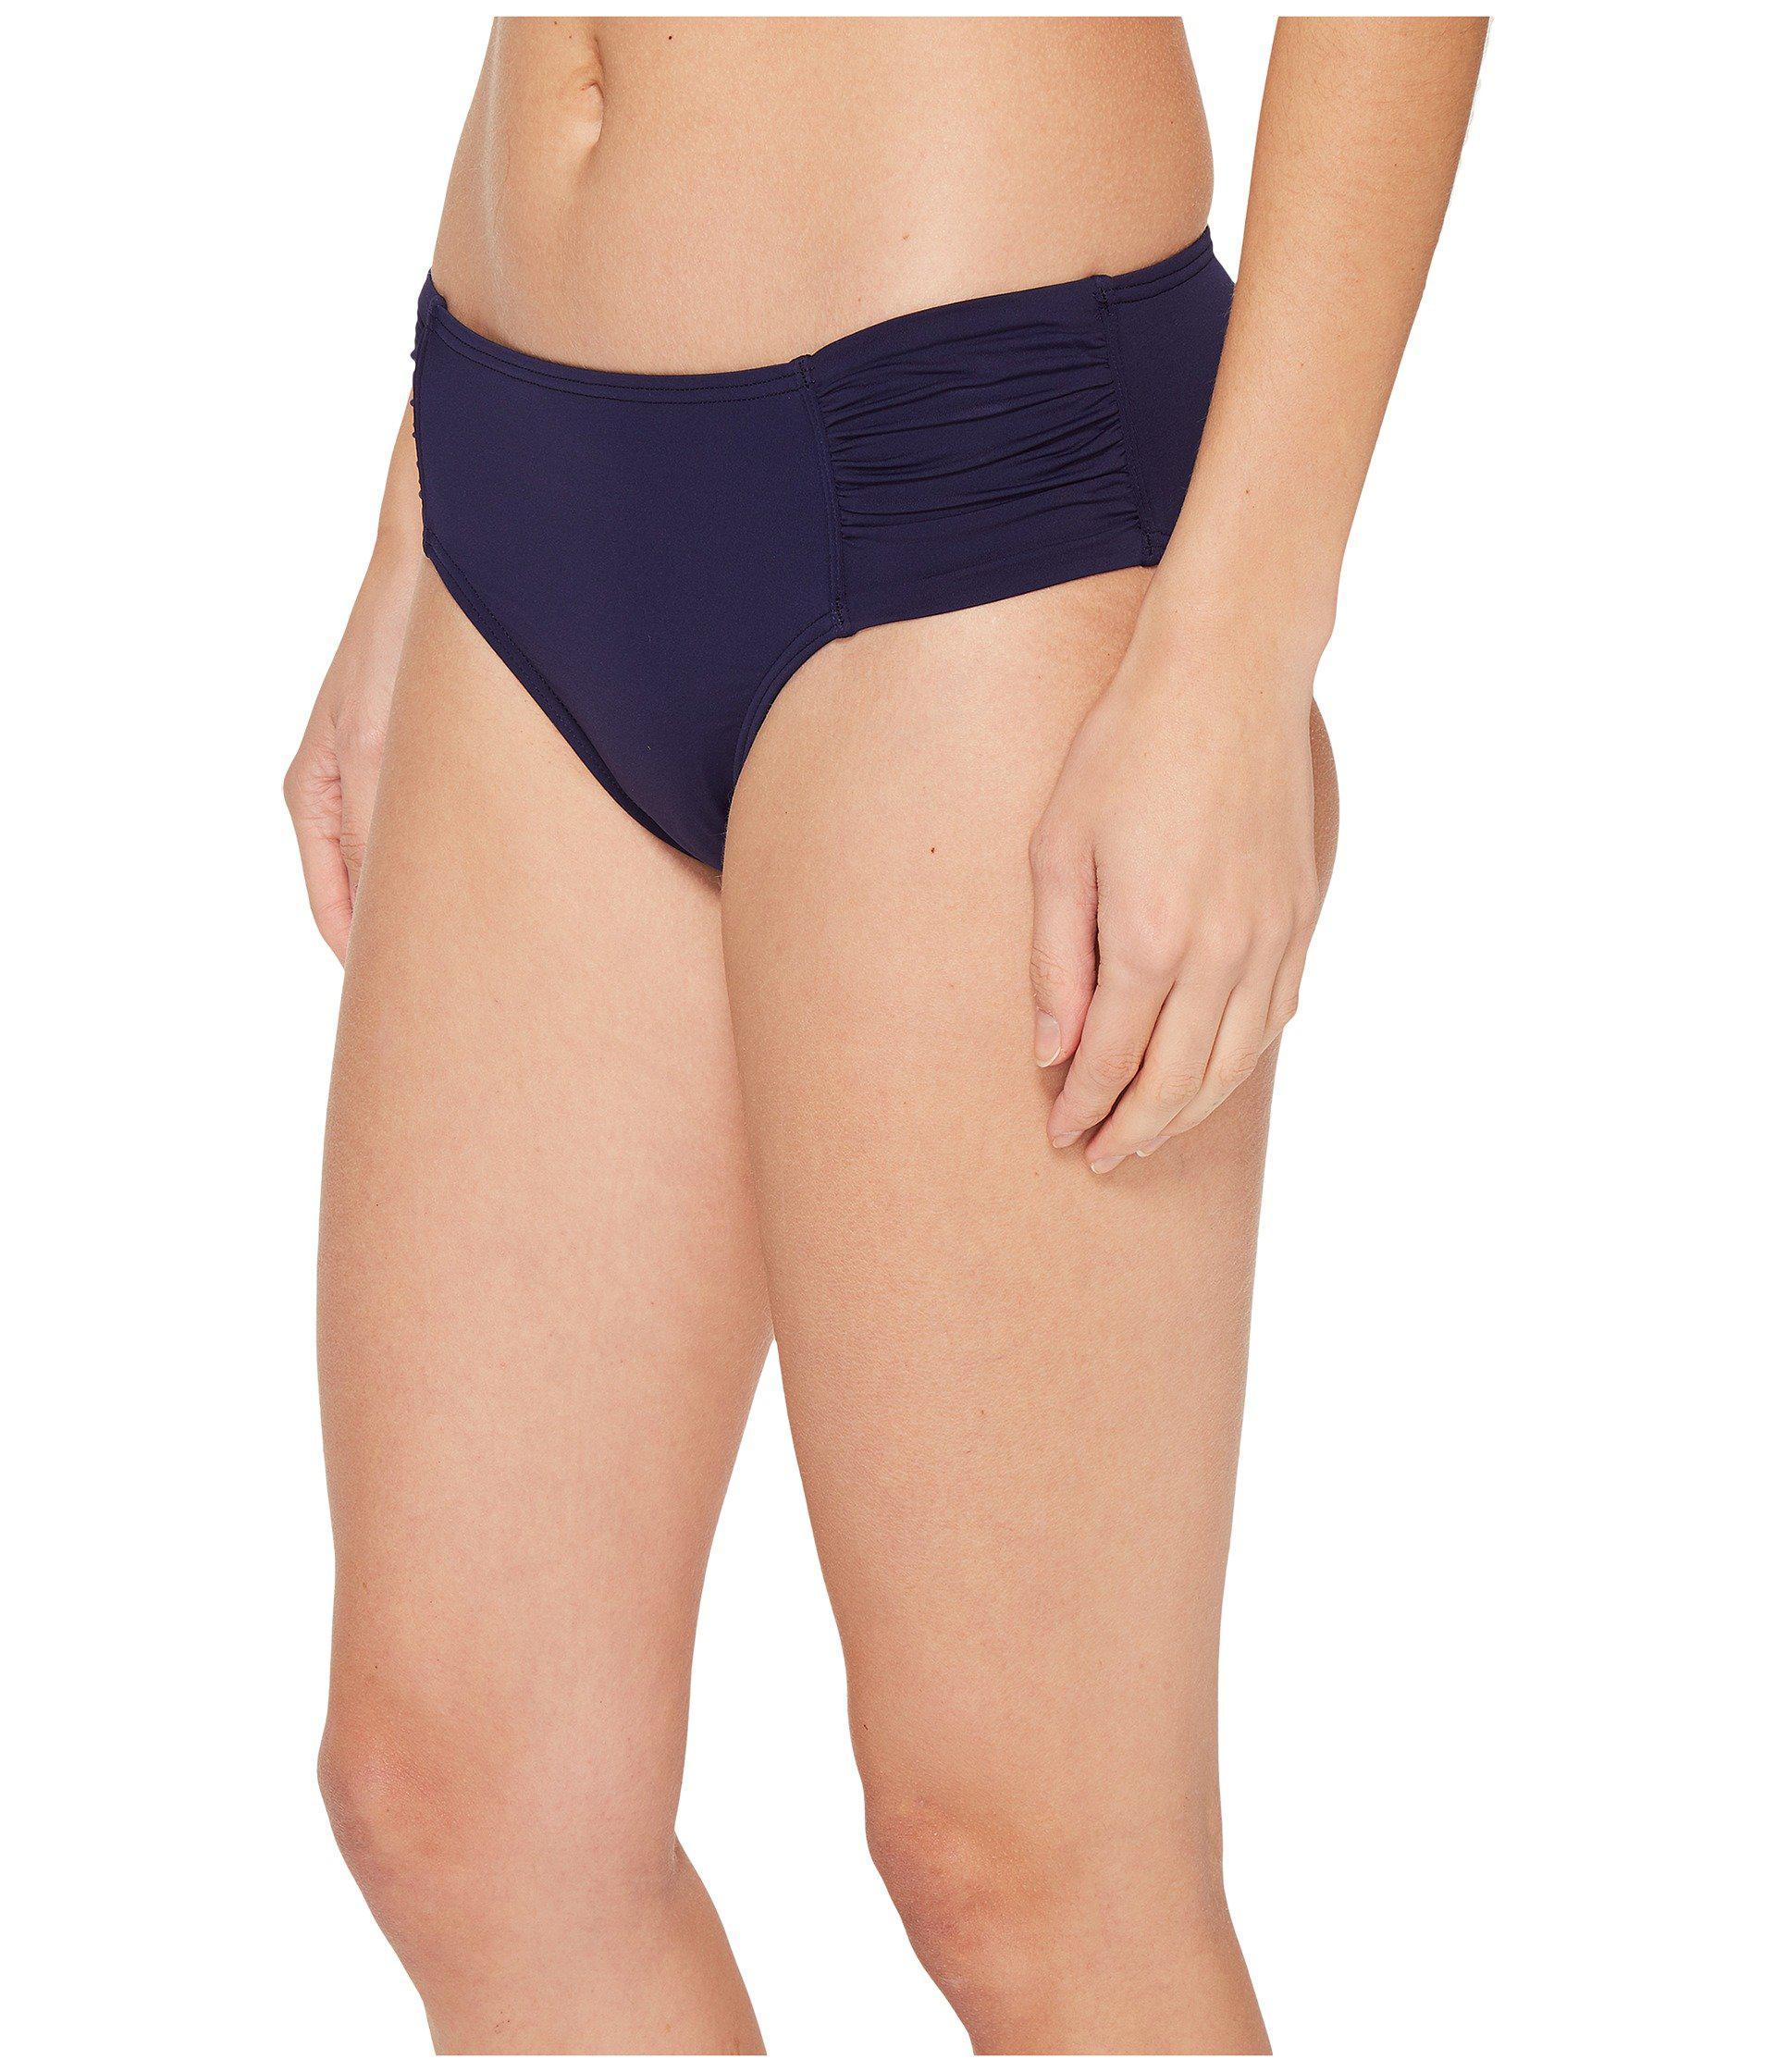 b4ca7feee2d0c Lyst - Tommy Bahama Pearl High-waist Side-shirred Bikini Bottom (black)  Women s Swimwear in Blue - Save 30.35714285714286%